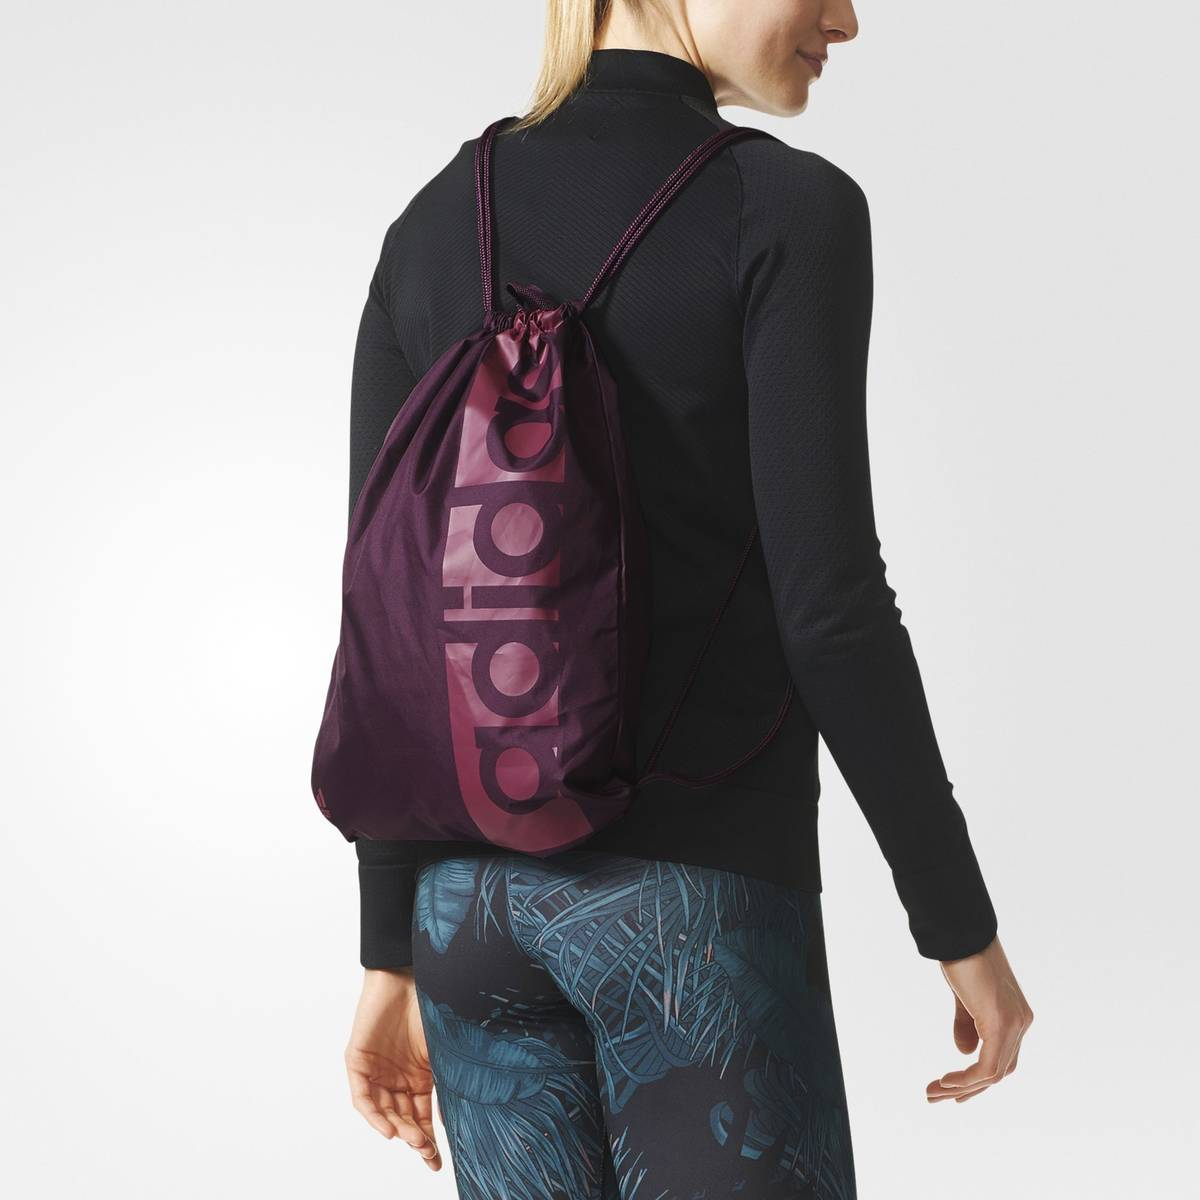 Pieni Adidas Laukku : Adidas laukku linear per gym bag luumu urheilujakone fi